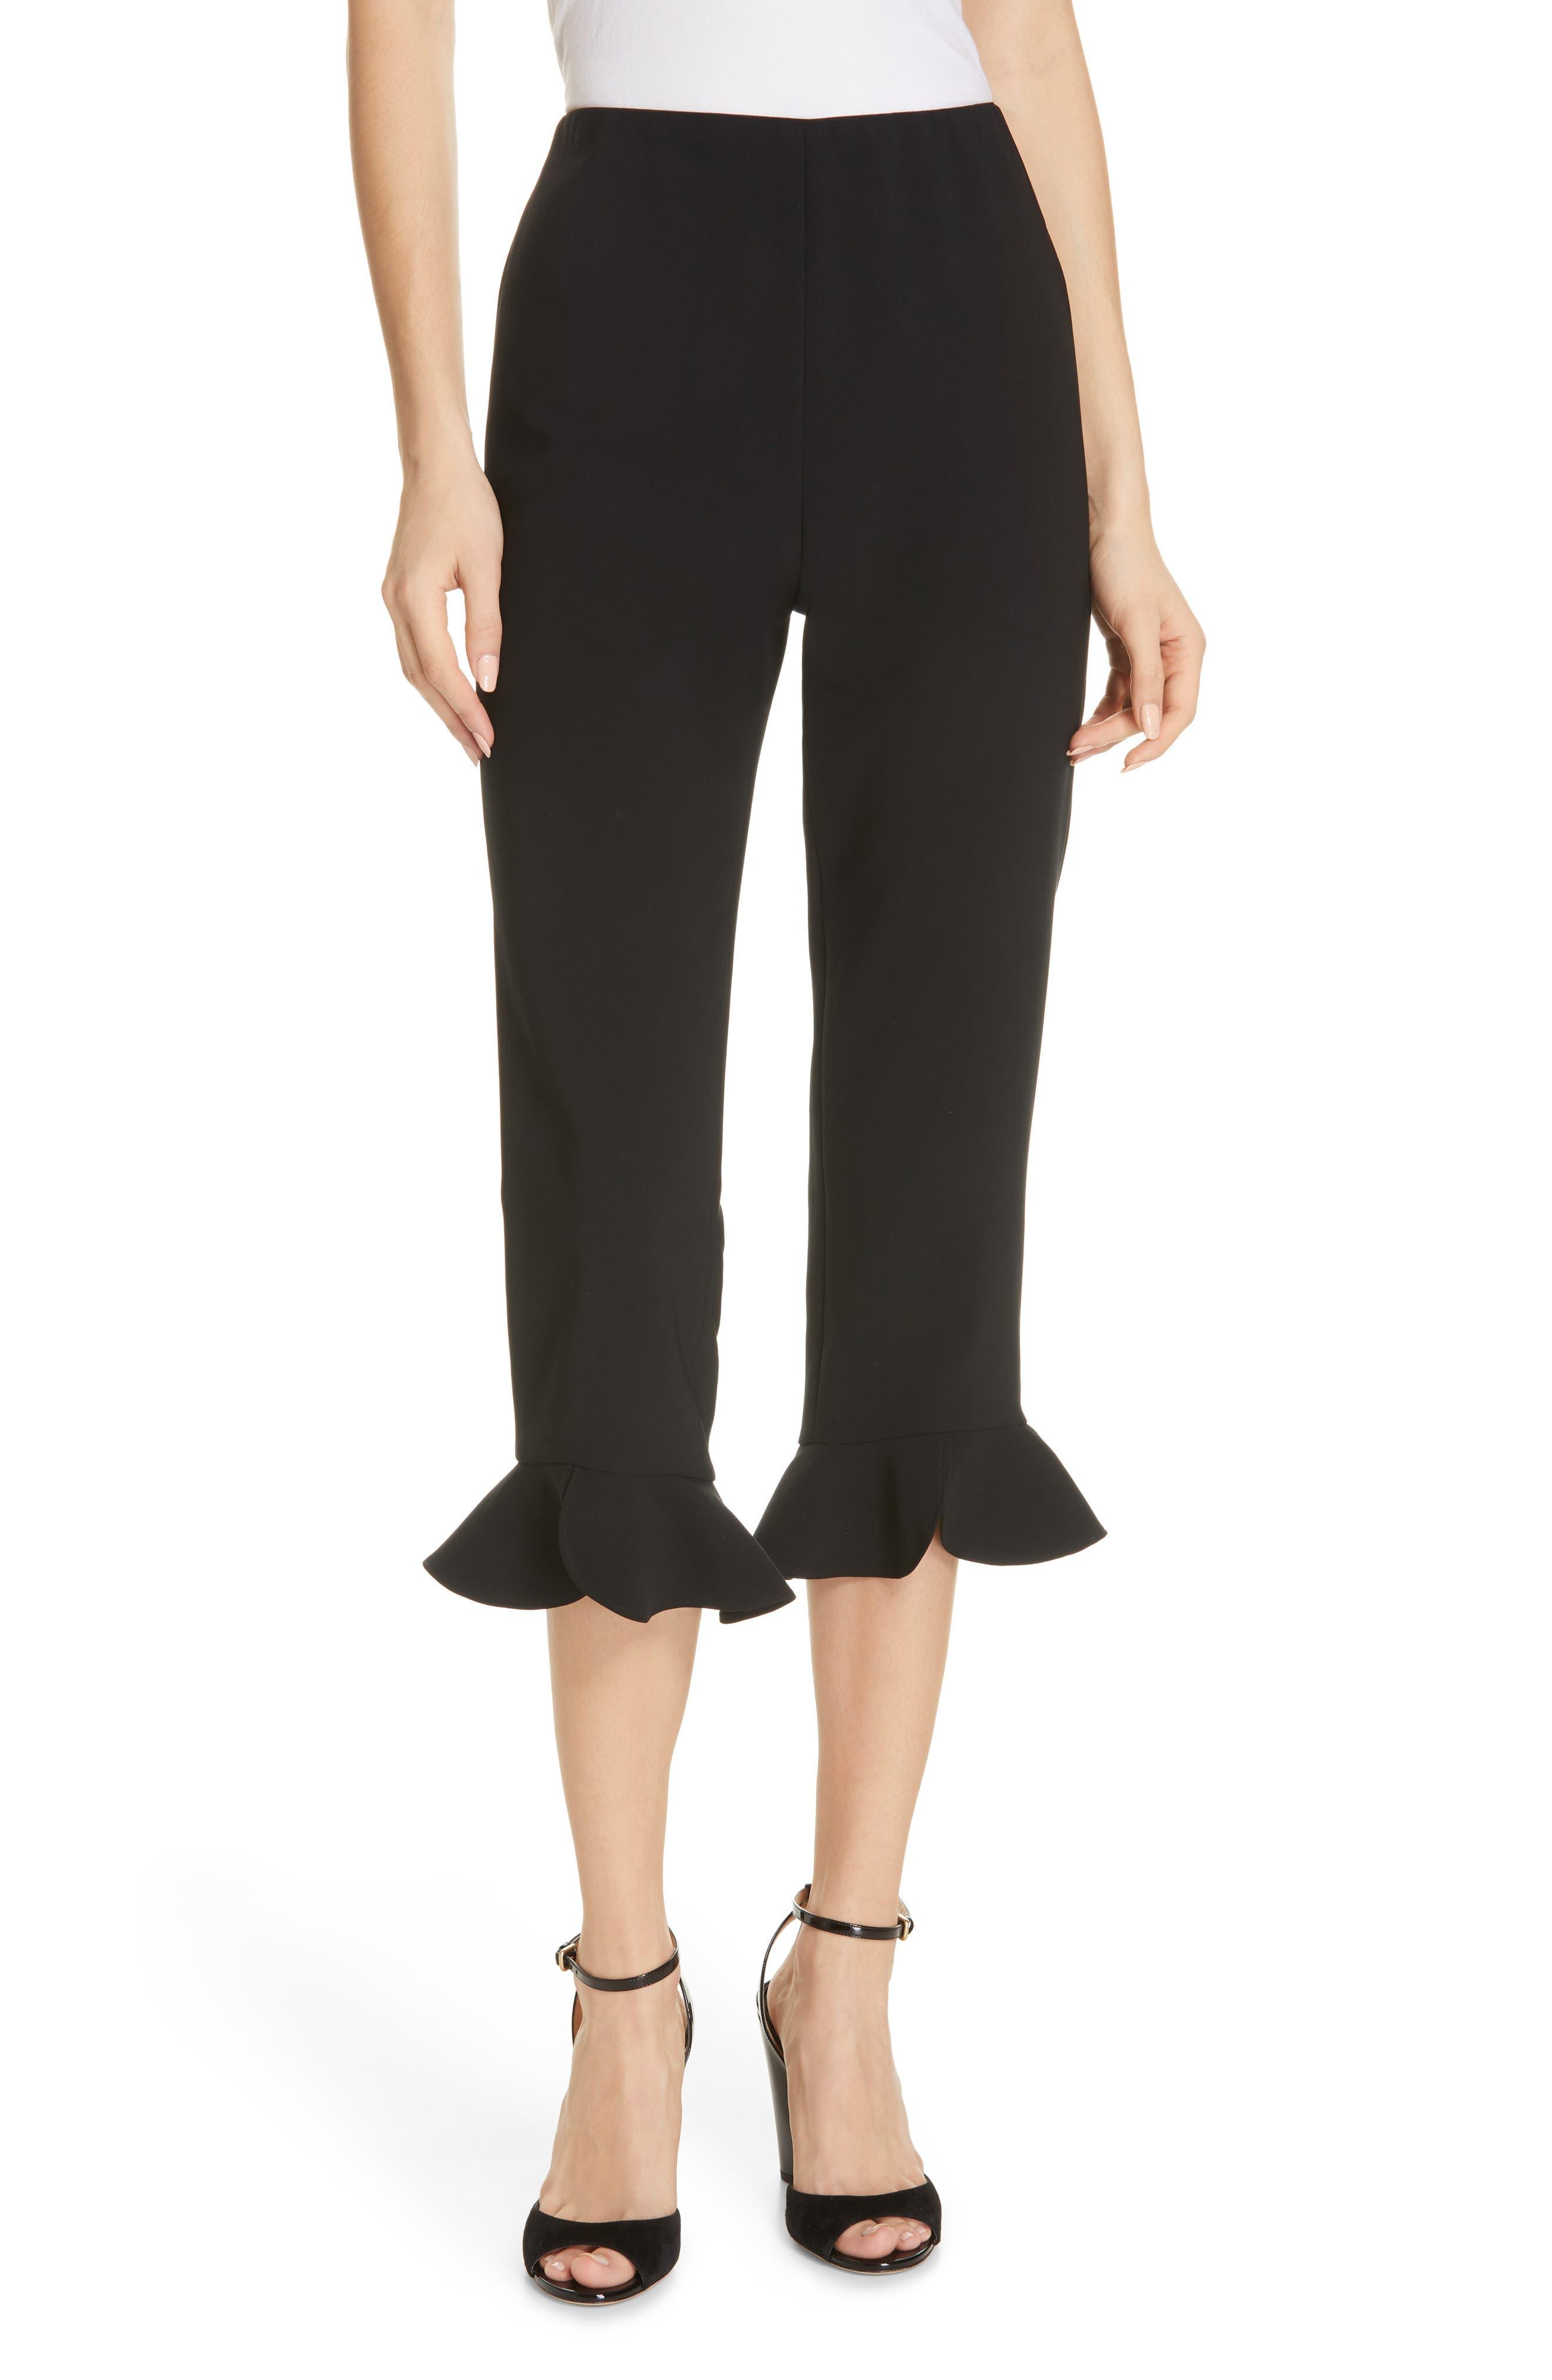 ALICE + OLIVIA Alena Ruffle Hem Crop Pants, Main, color, BLACK